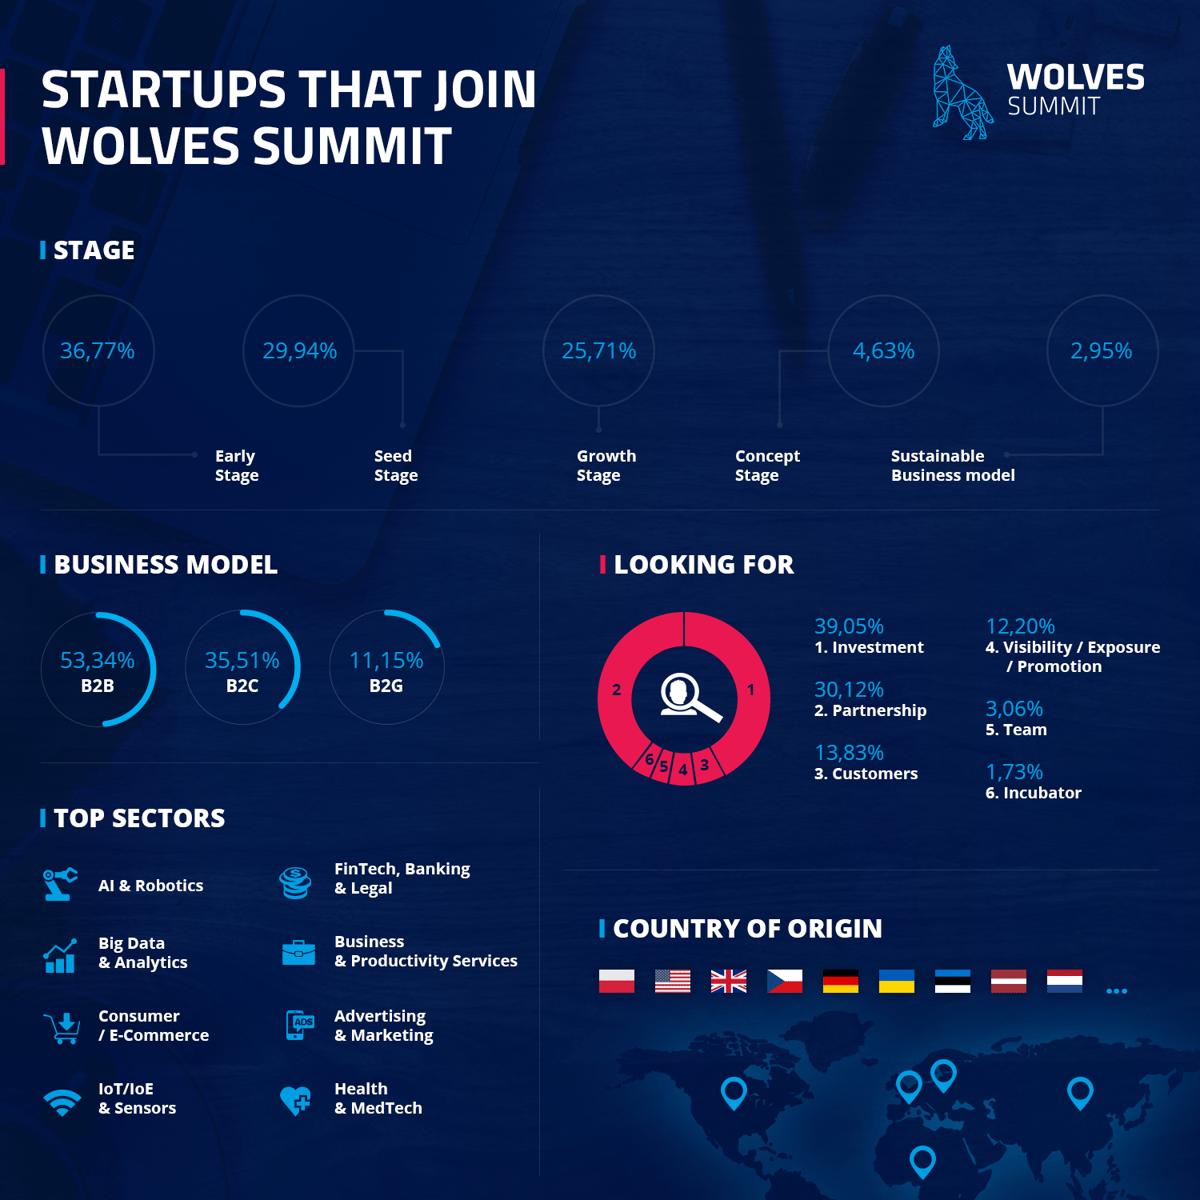 Wolves Summit startups